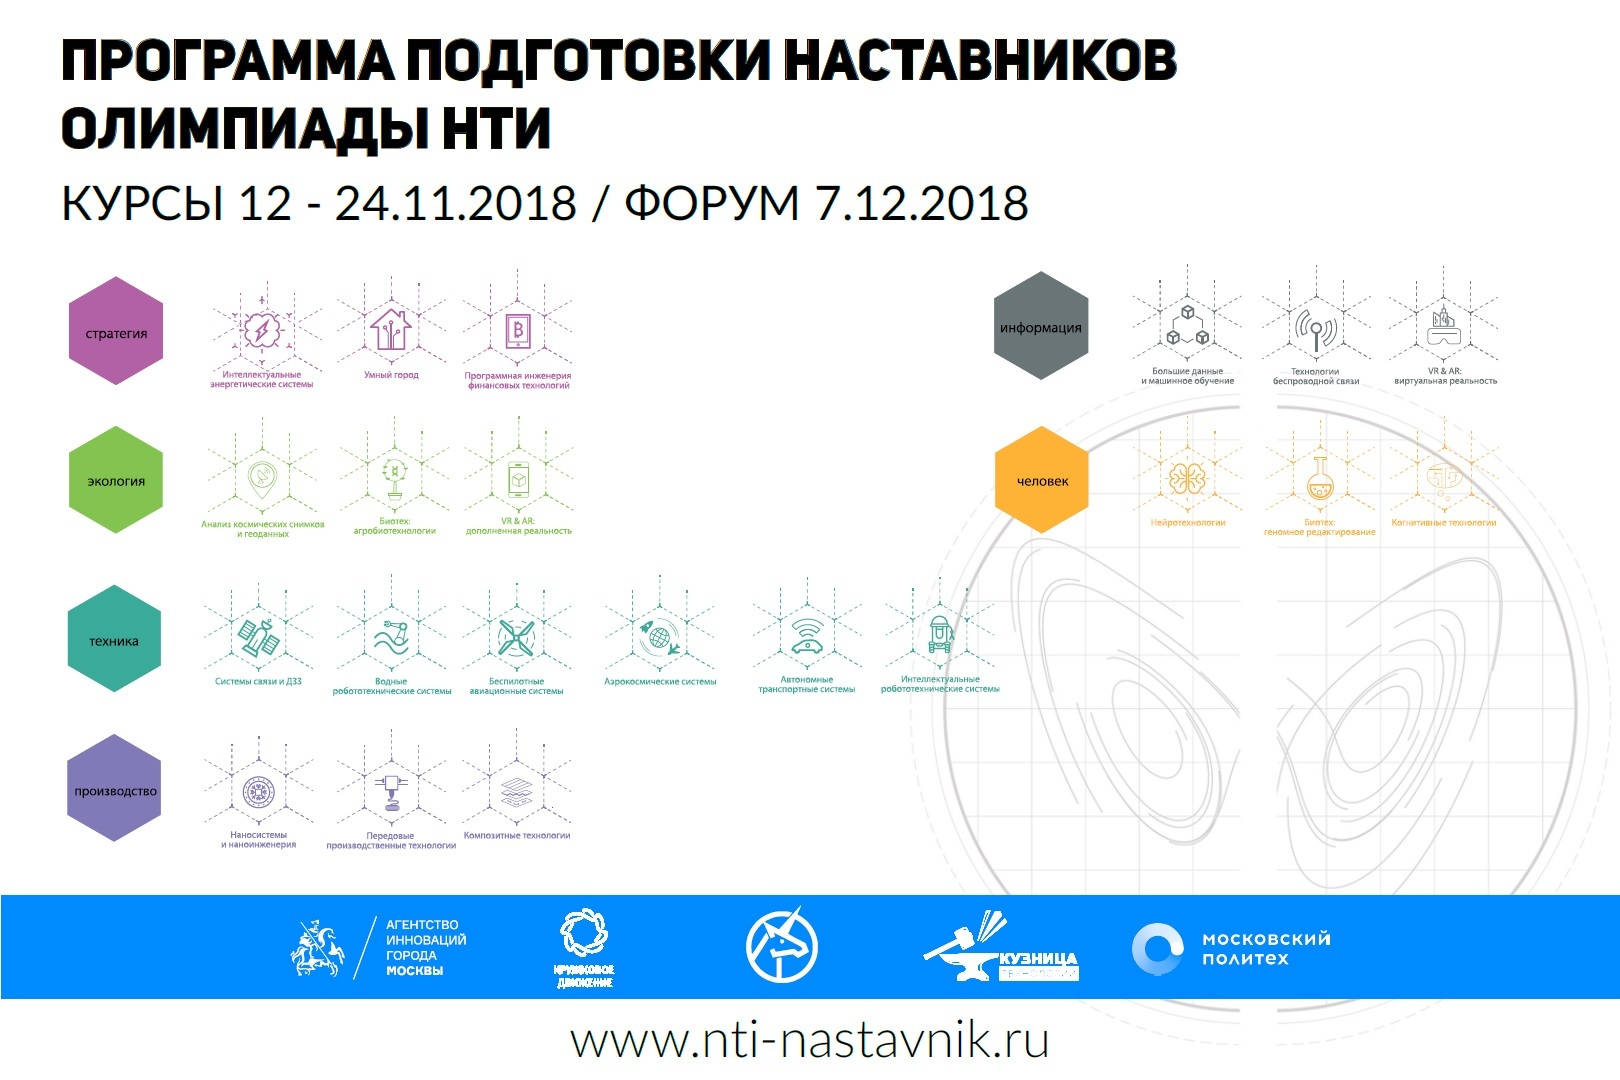 (c) Nti-nastavnik.ru